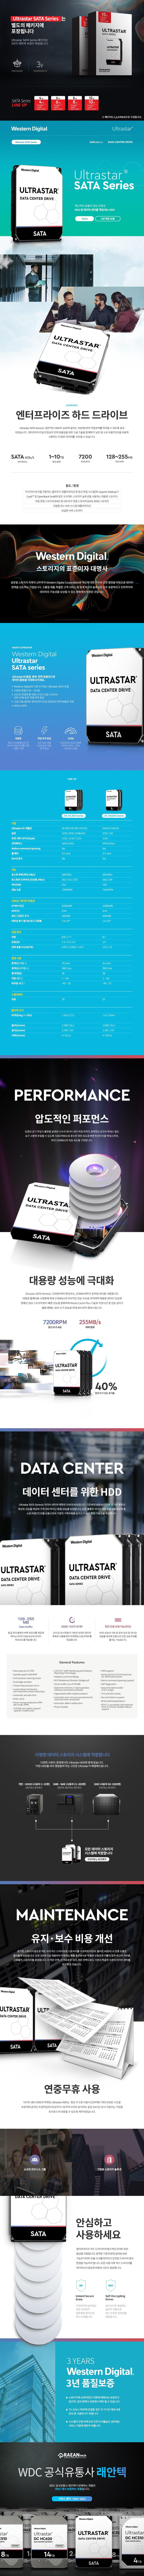 Western Digital  10TB Ultrastar DC HC330 WUS721010ALE6L4 패키지 (SATA3/7200/256M/4PACK)